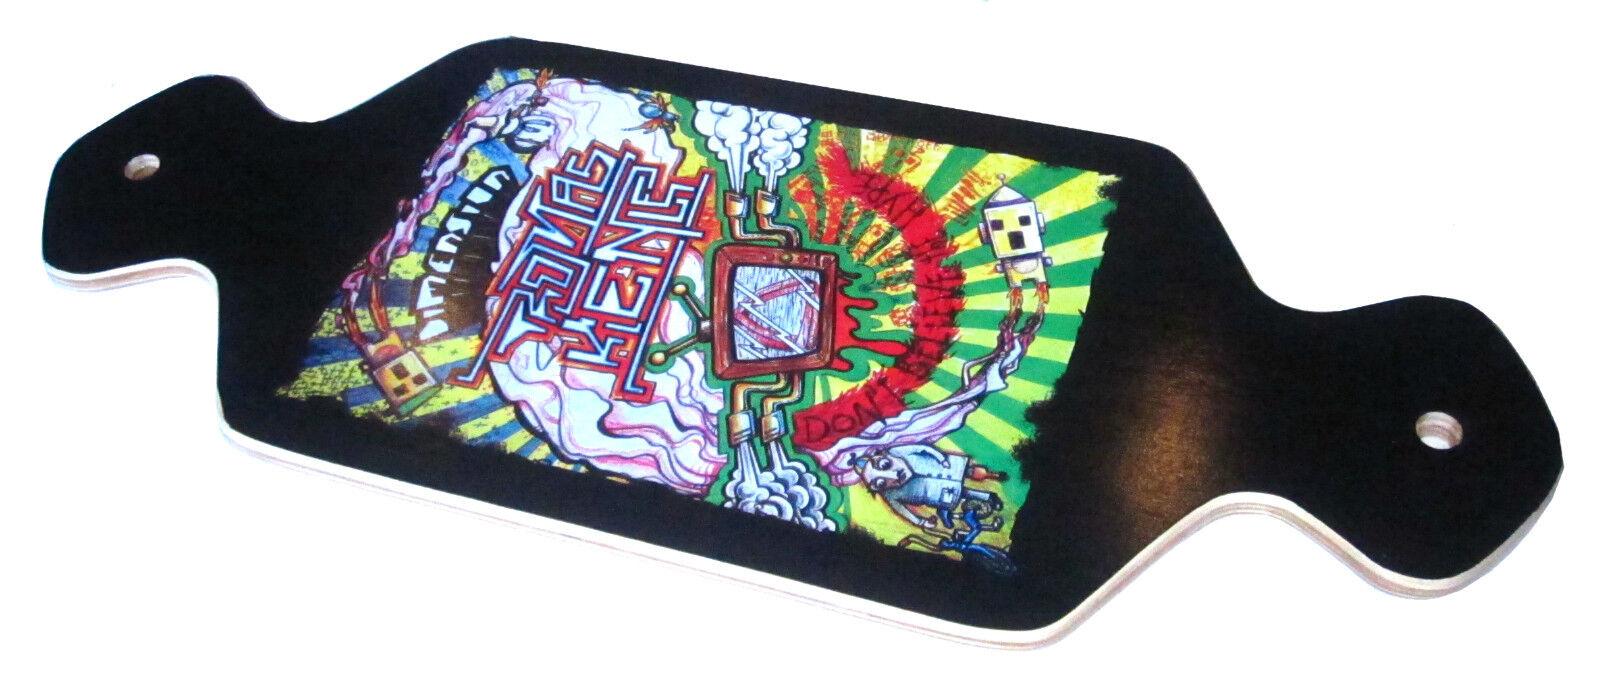 Snakeboard, Original Dimension Thomas Kienle Campaign Streetboard Bar 55cm